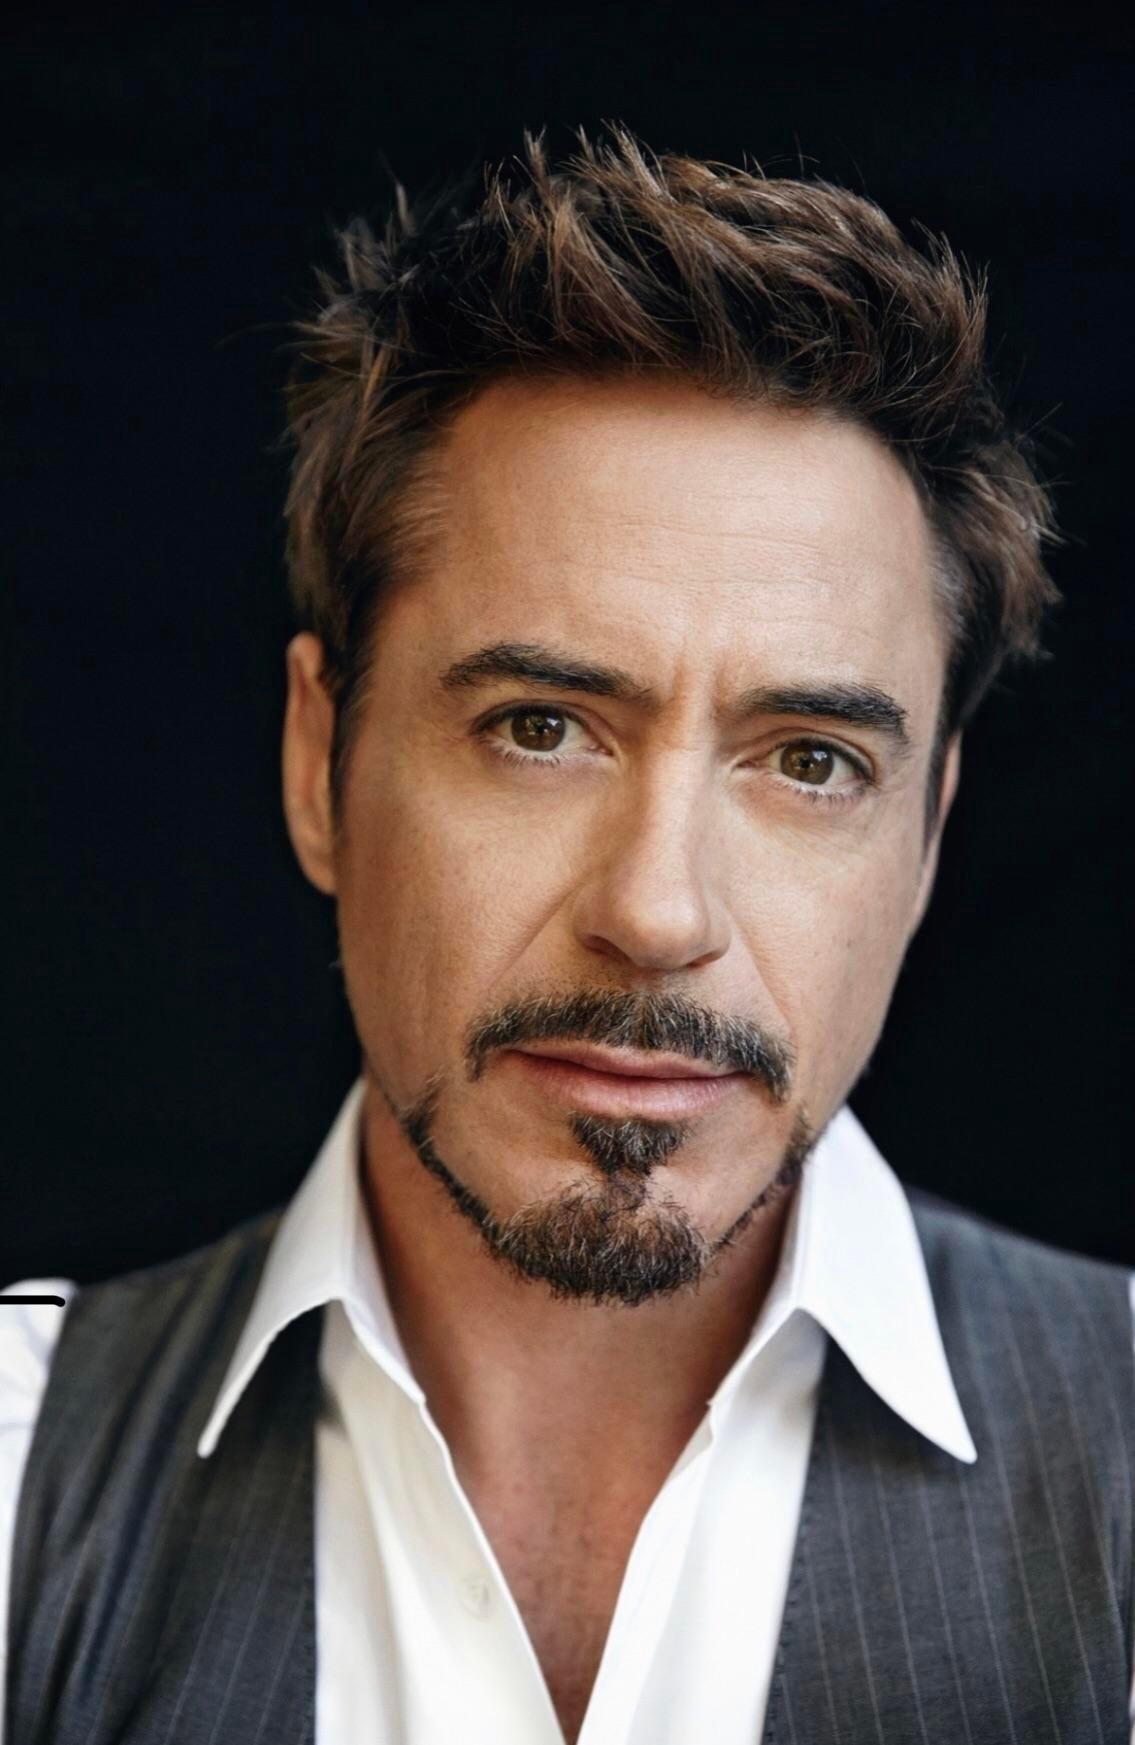 Robert Downey, Jr. classic aesthetic beard style